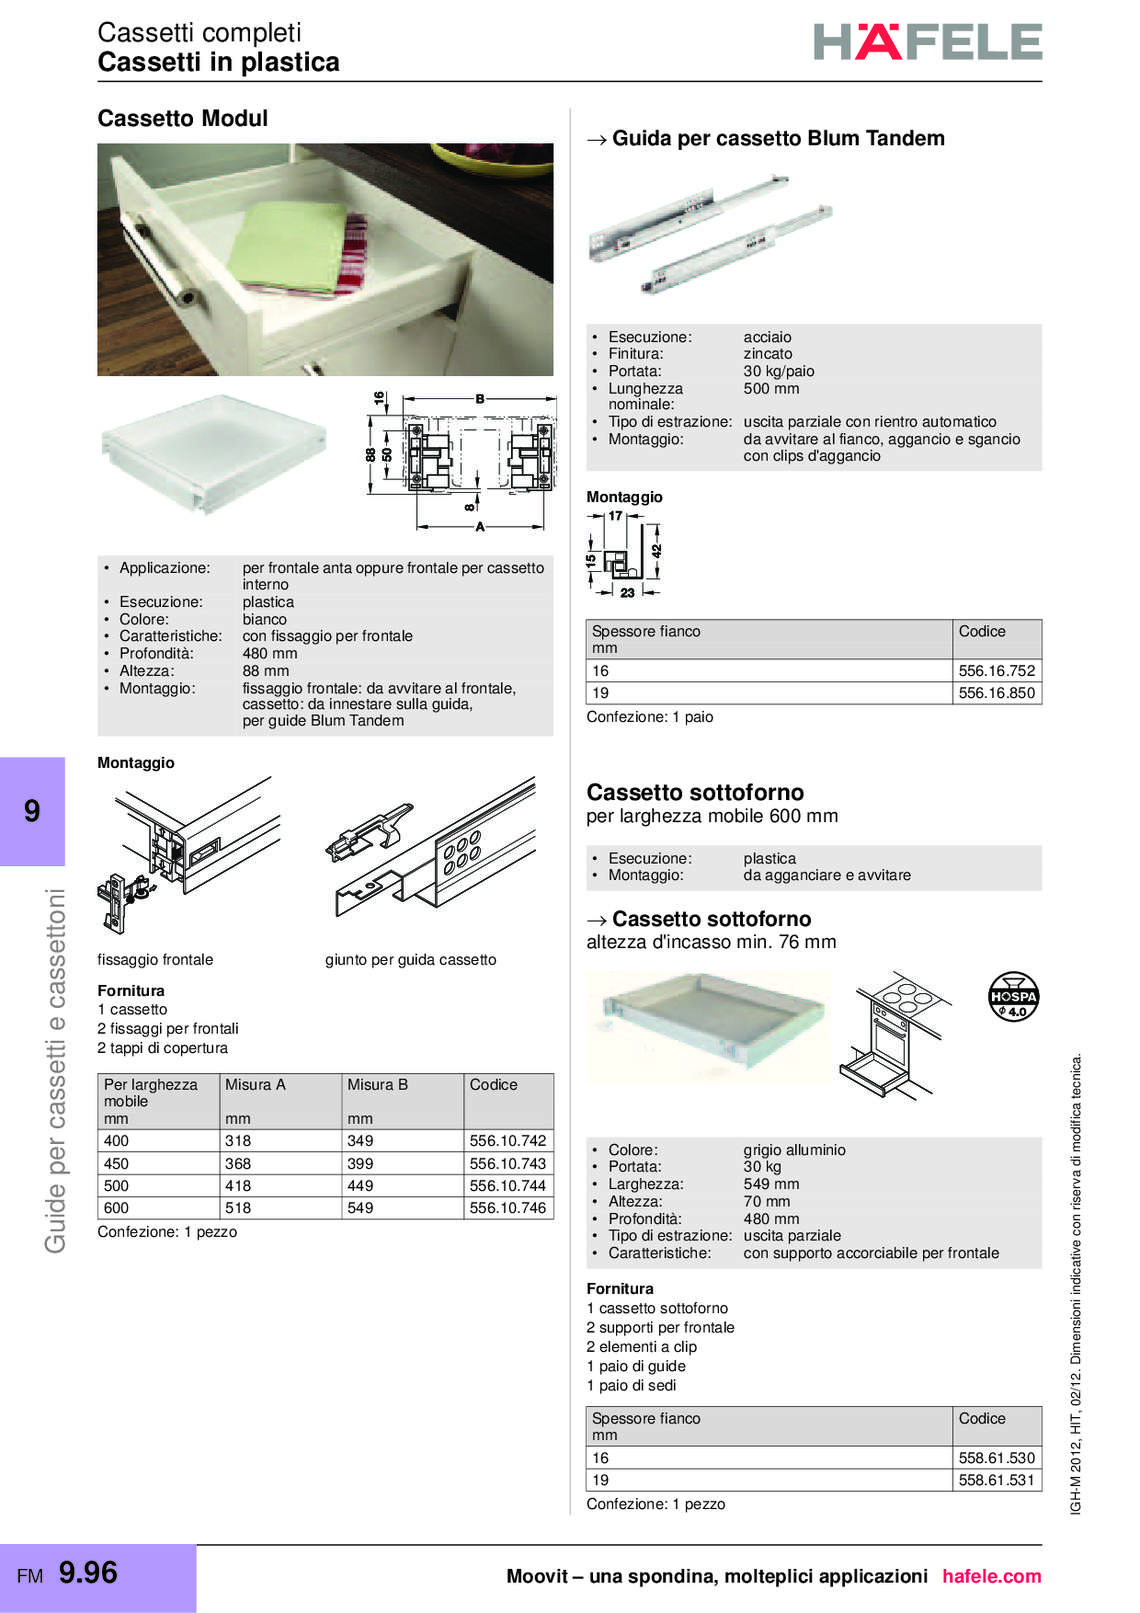 hafele-spondine-e-guide-per-mobili_40_143.jpg